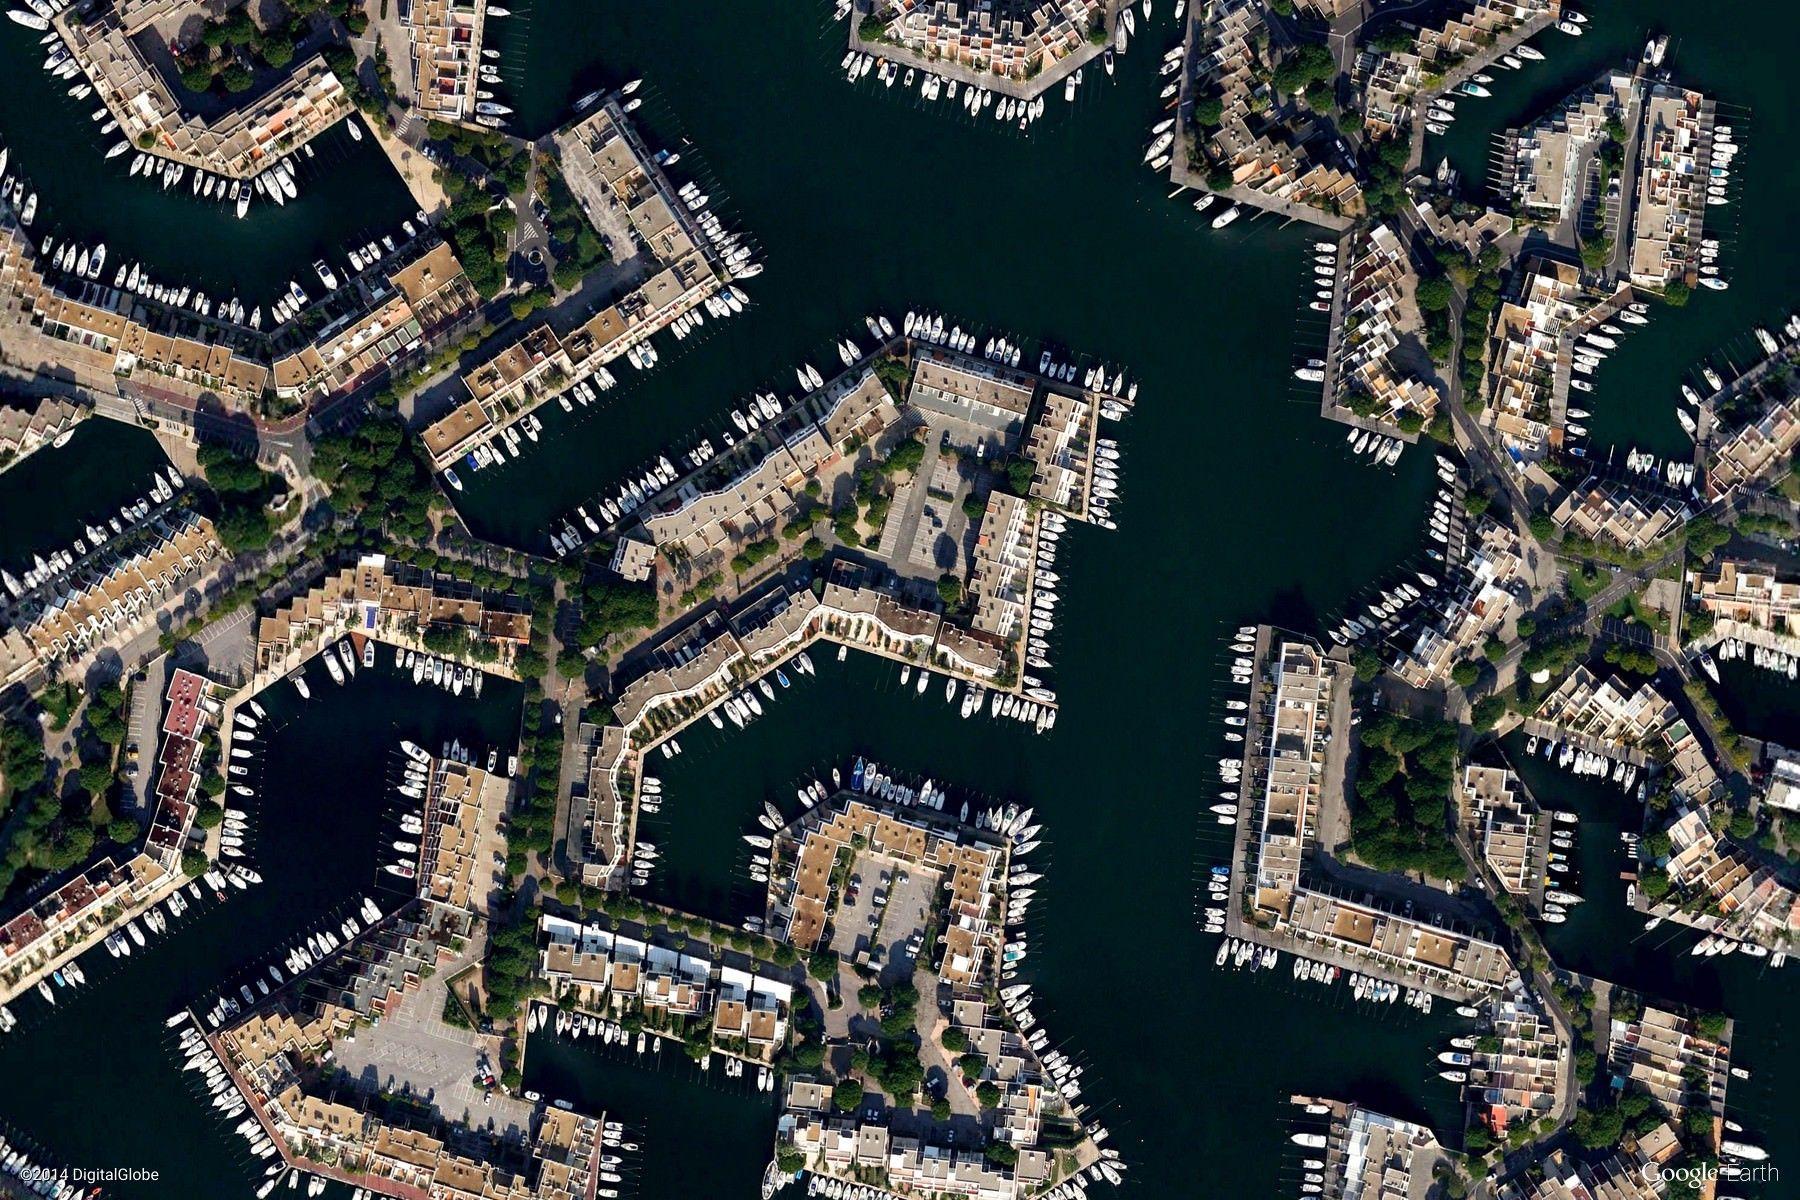 Le Grau Du Roi France Urban Pattern Google Earth View 2444 Earth View Google Earth View Google Earth